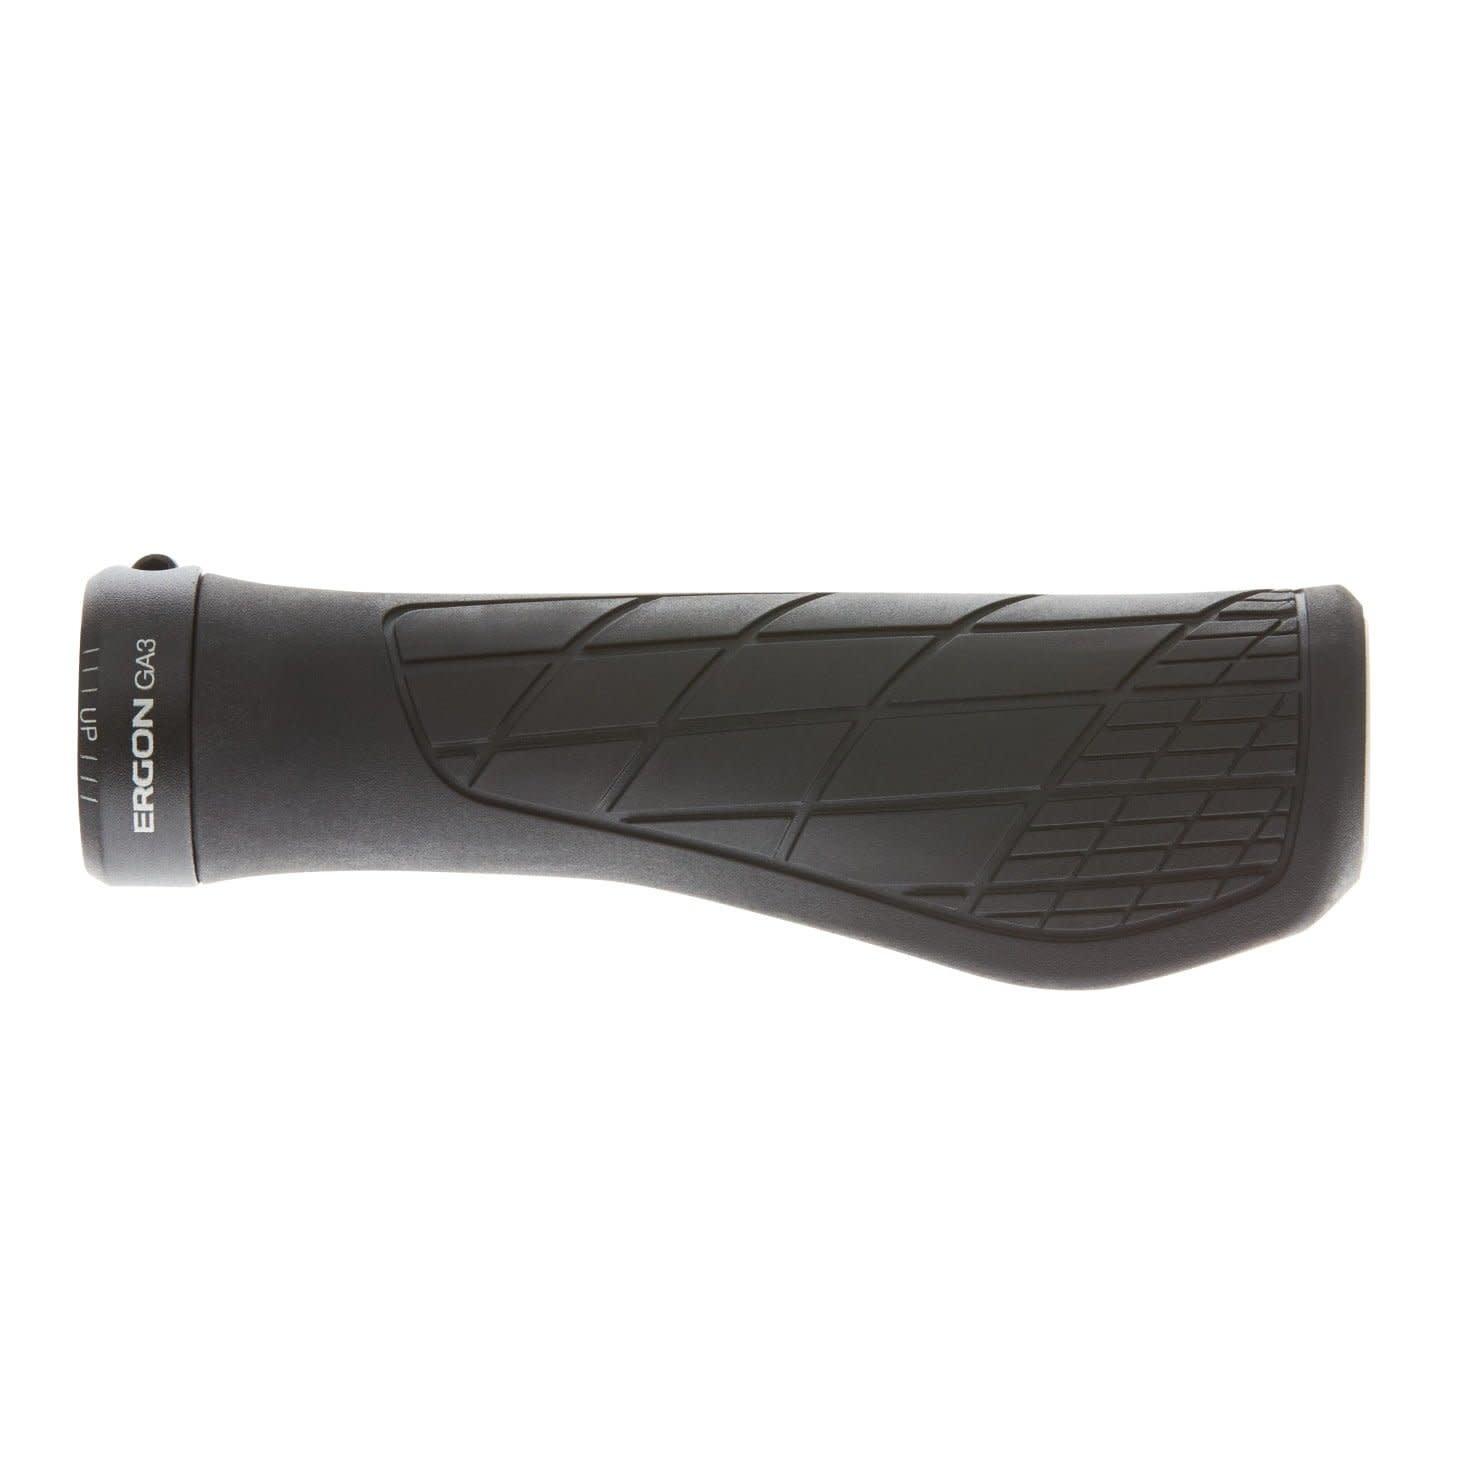 Ergon Ergon GA3 Grips Black